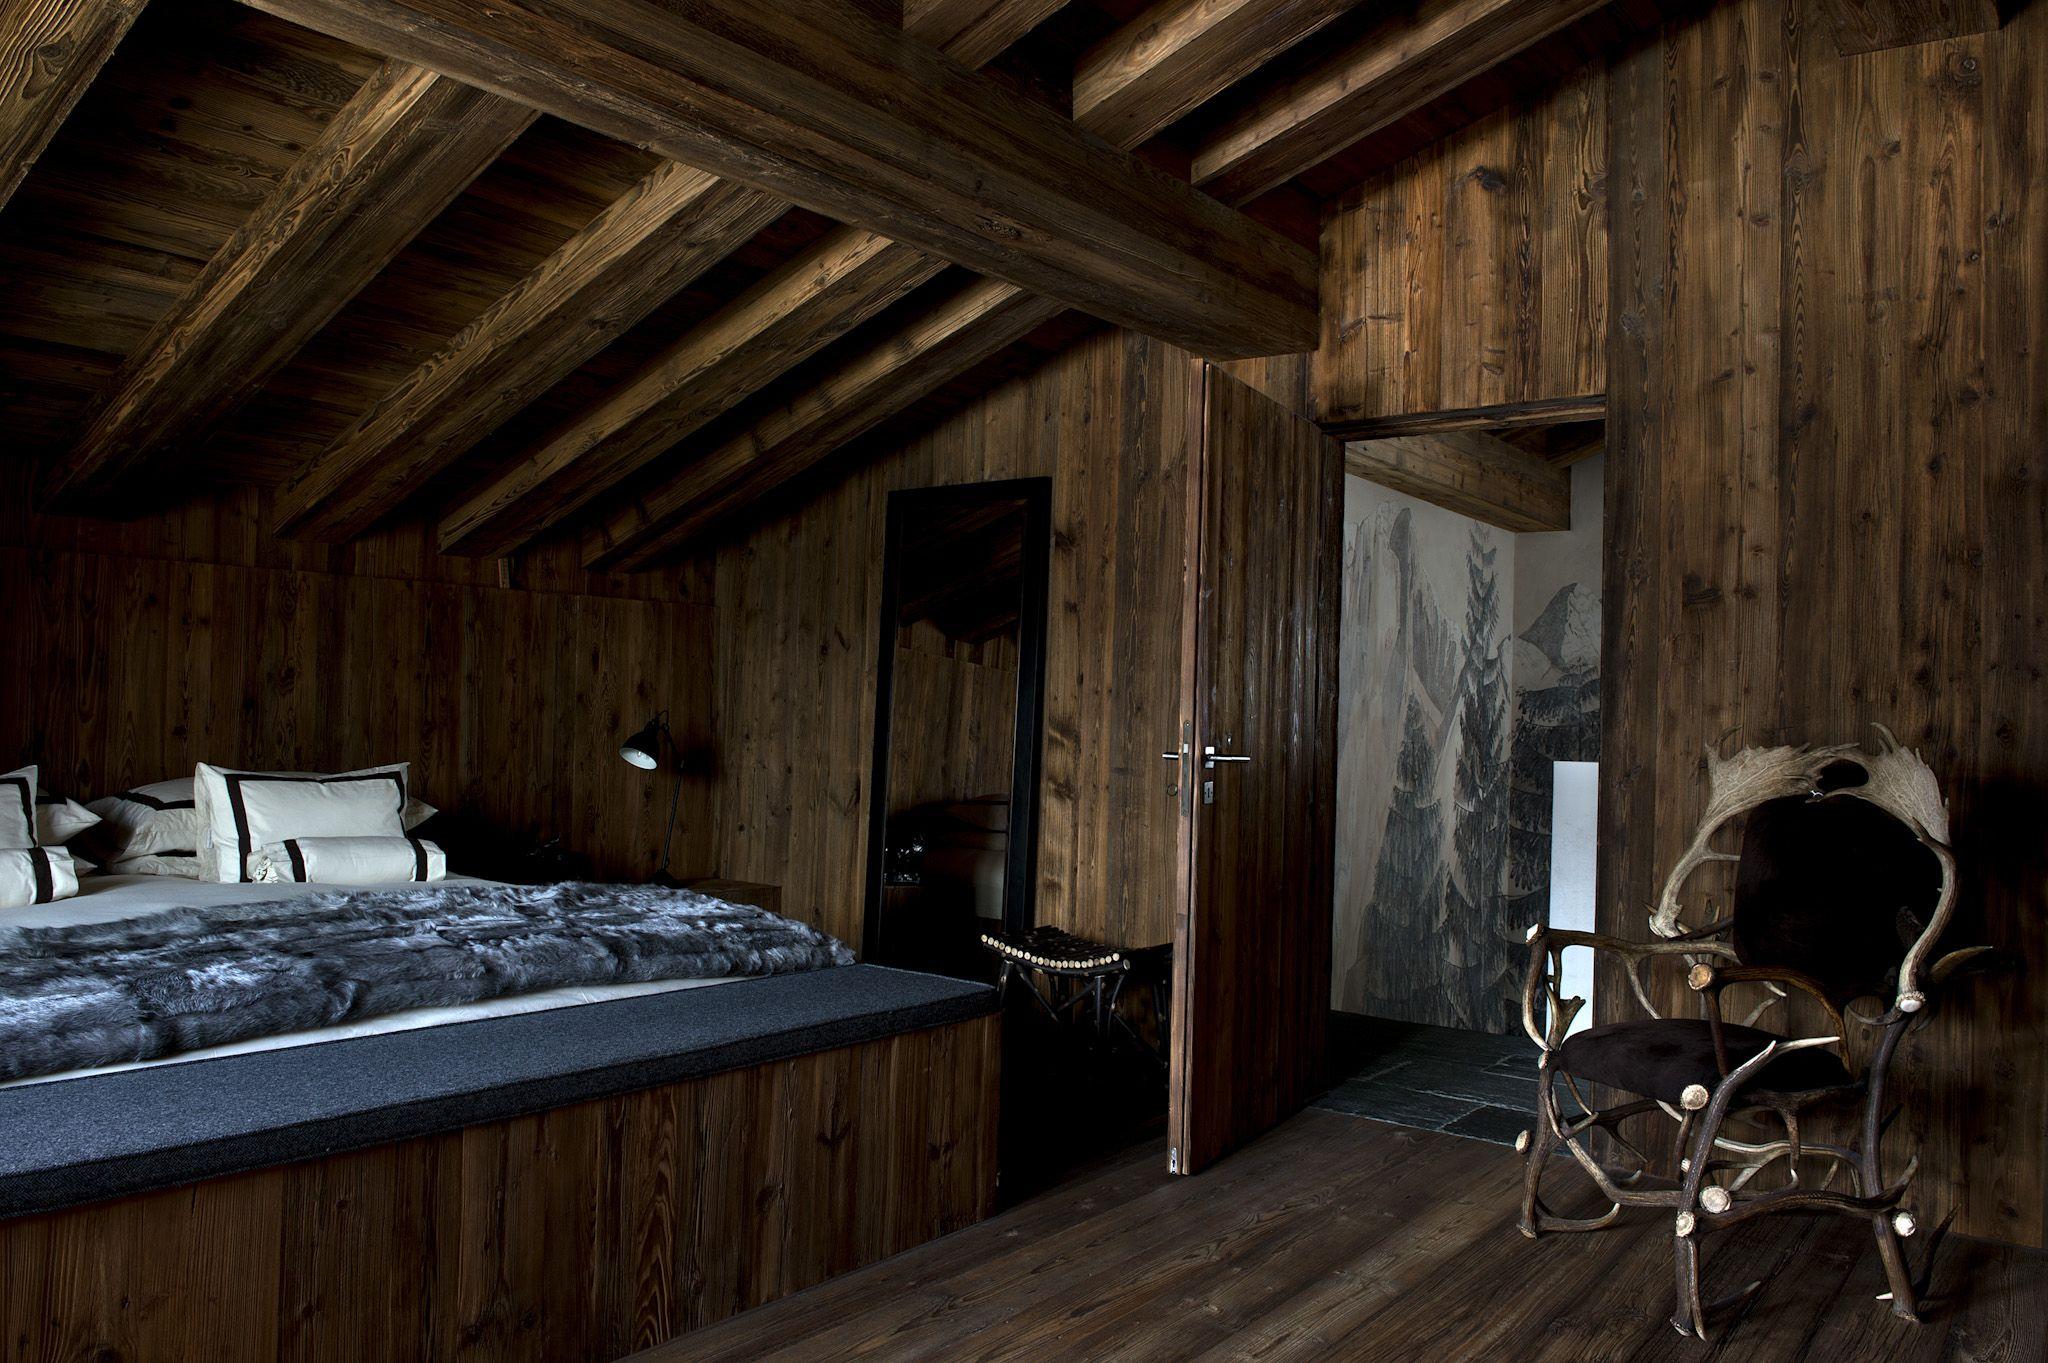 remo ruffini / chalet st-moritz   Interiors   Pinterest   Spaces ...